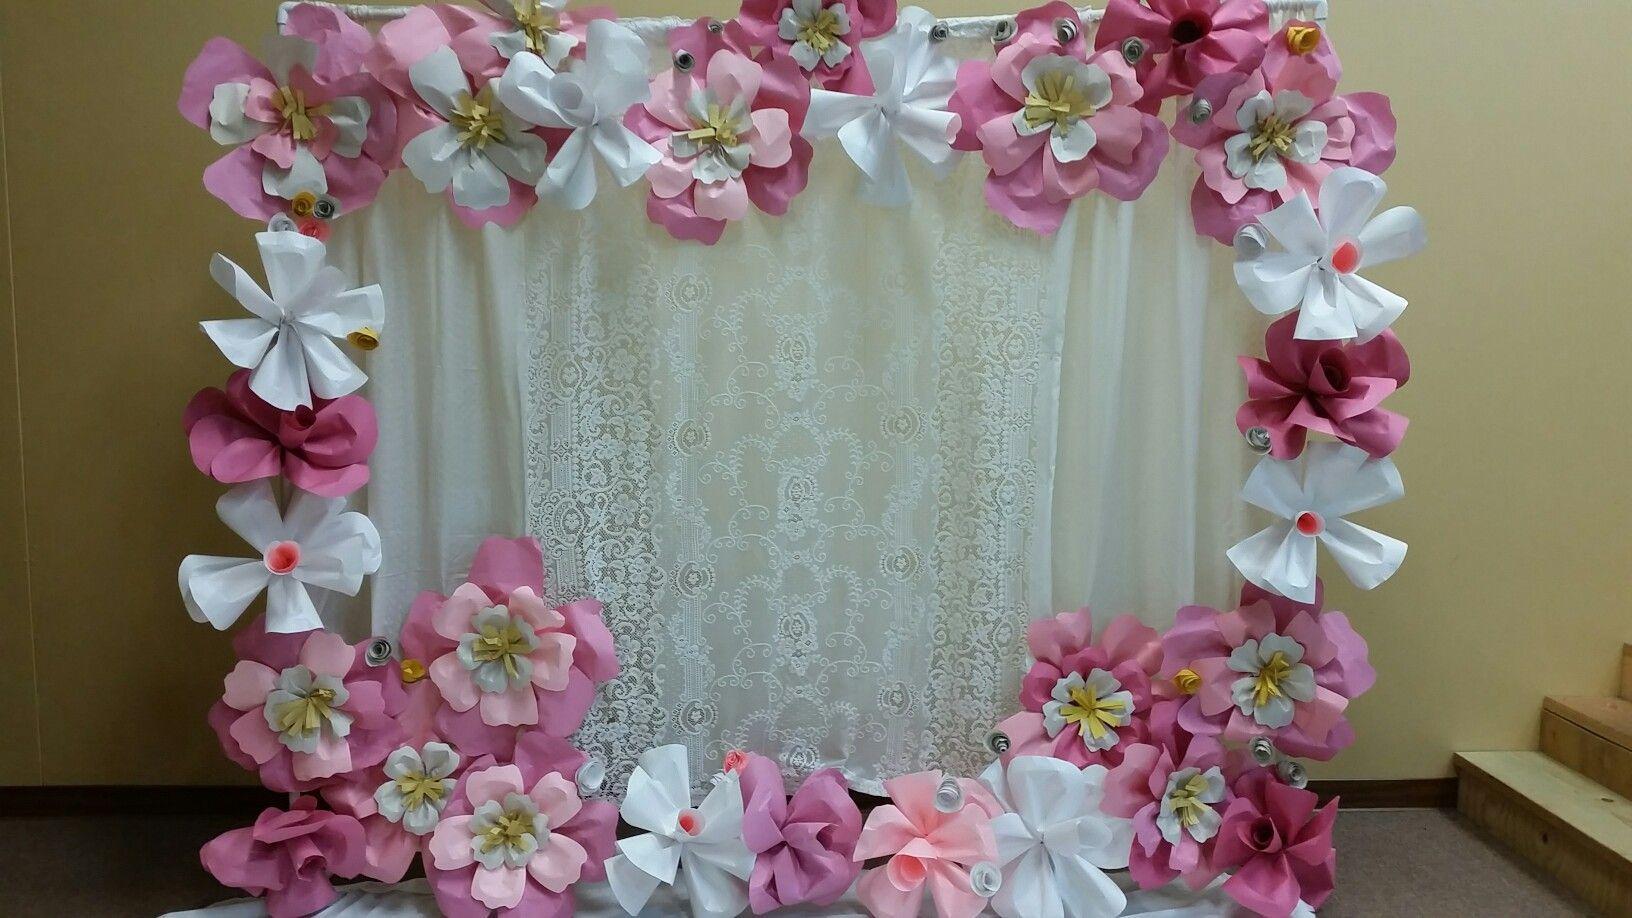 Diy large paper flowers and diy pvc pipe backdrop stand #pvcpipebackdrop Diy large paper flowers and diy pvc pipe backdrop stand #pvcpipebackdrop